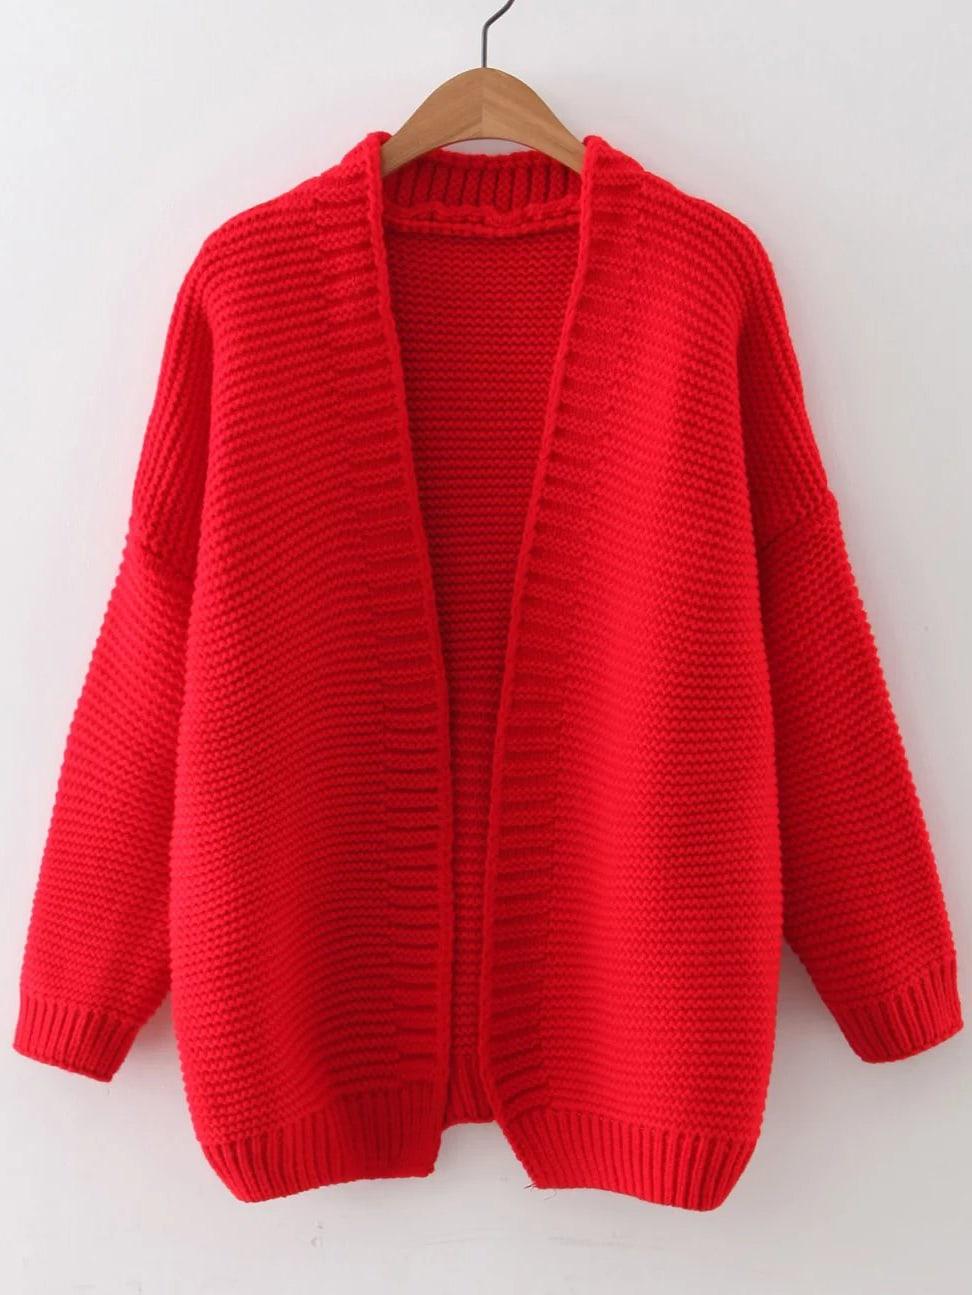 Red Open Front Drop Shoulder Cardigan sweater160922222